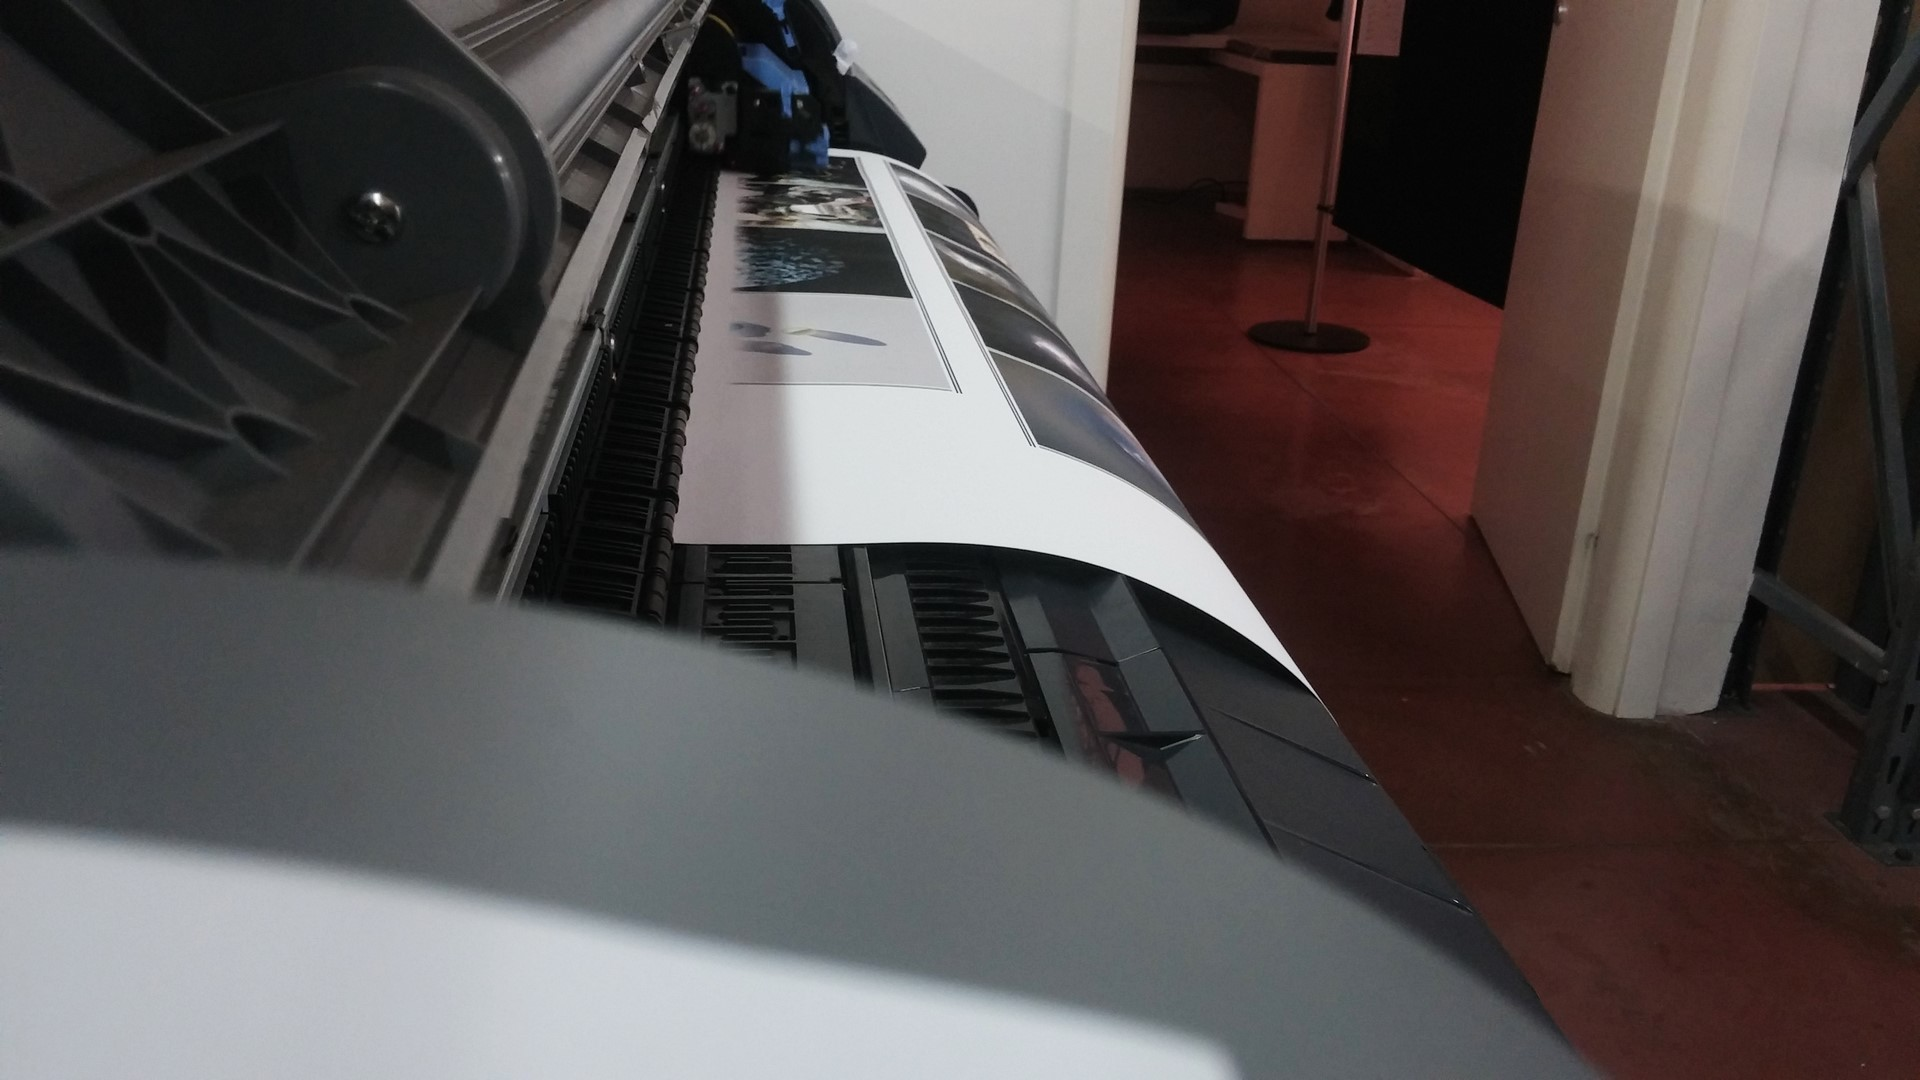 Stampa Fine Art - impaginazione e creativita'